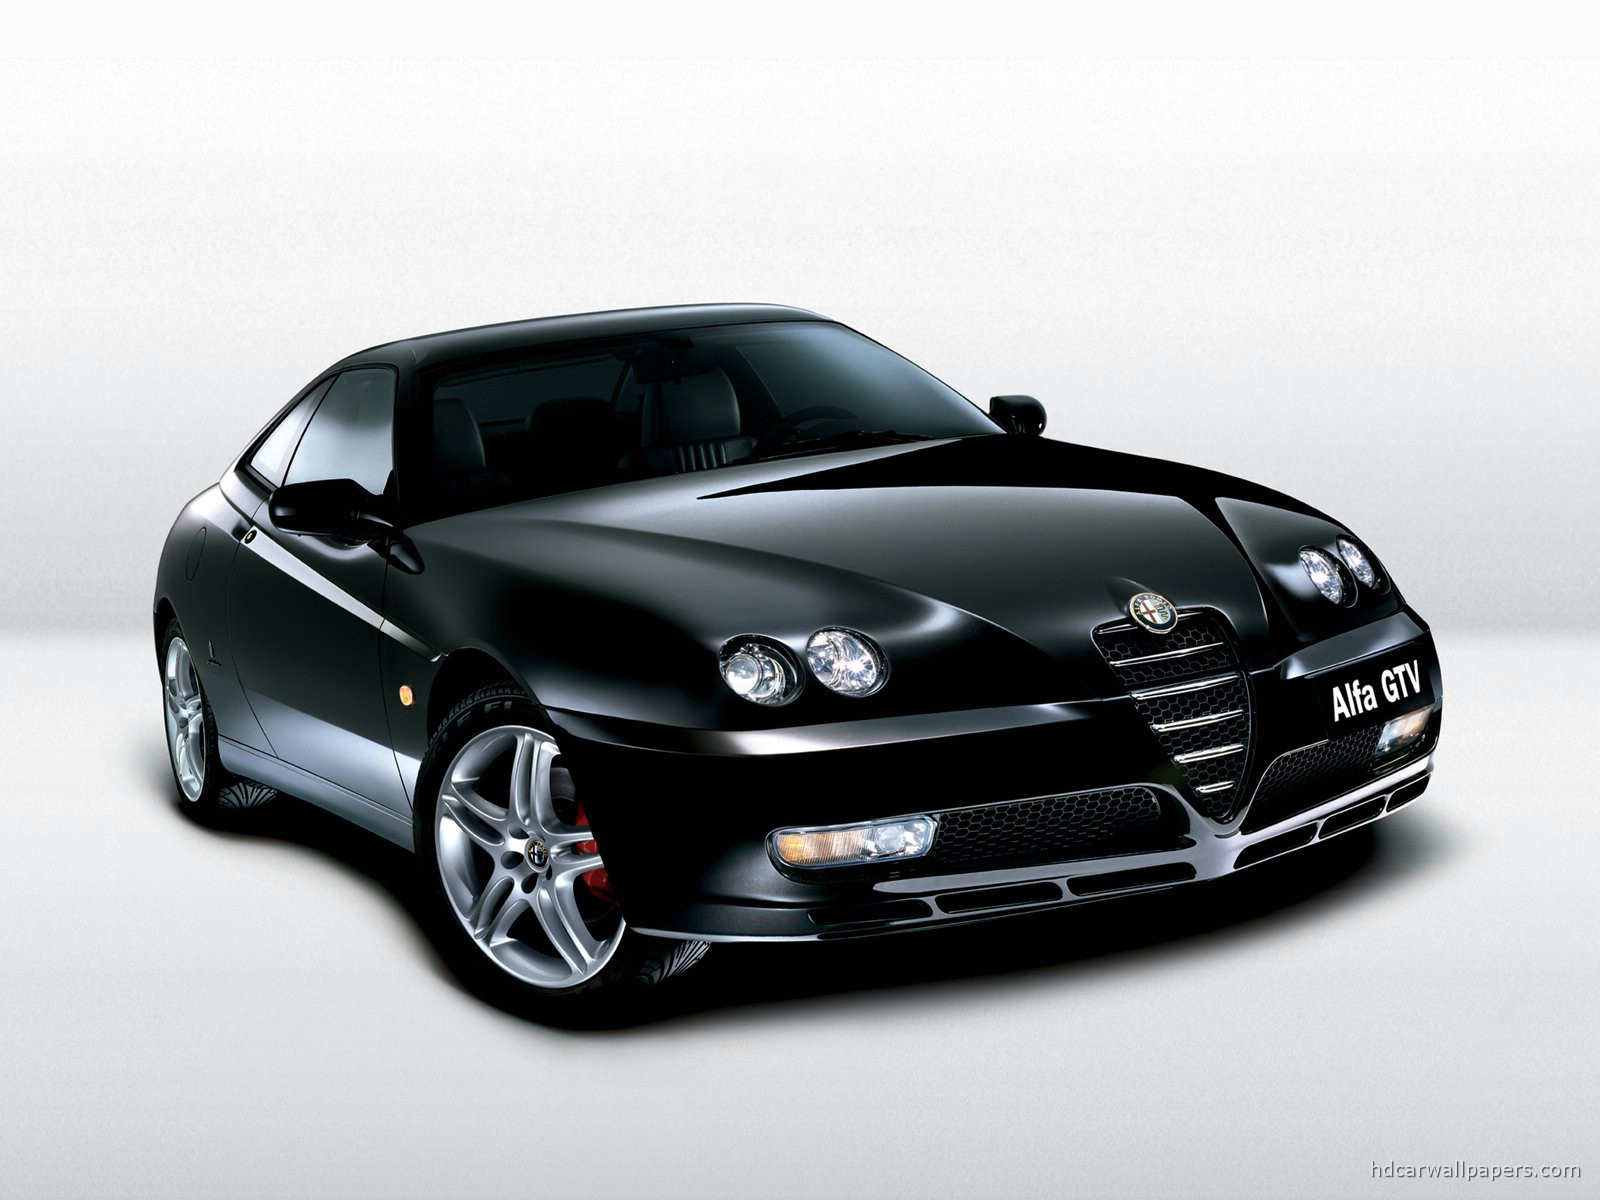 Alfa Romeo Gtv Wallpaper Hd Car Wallpapers Id 10